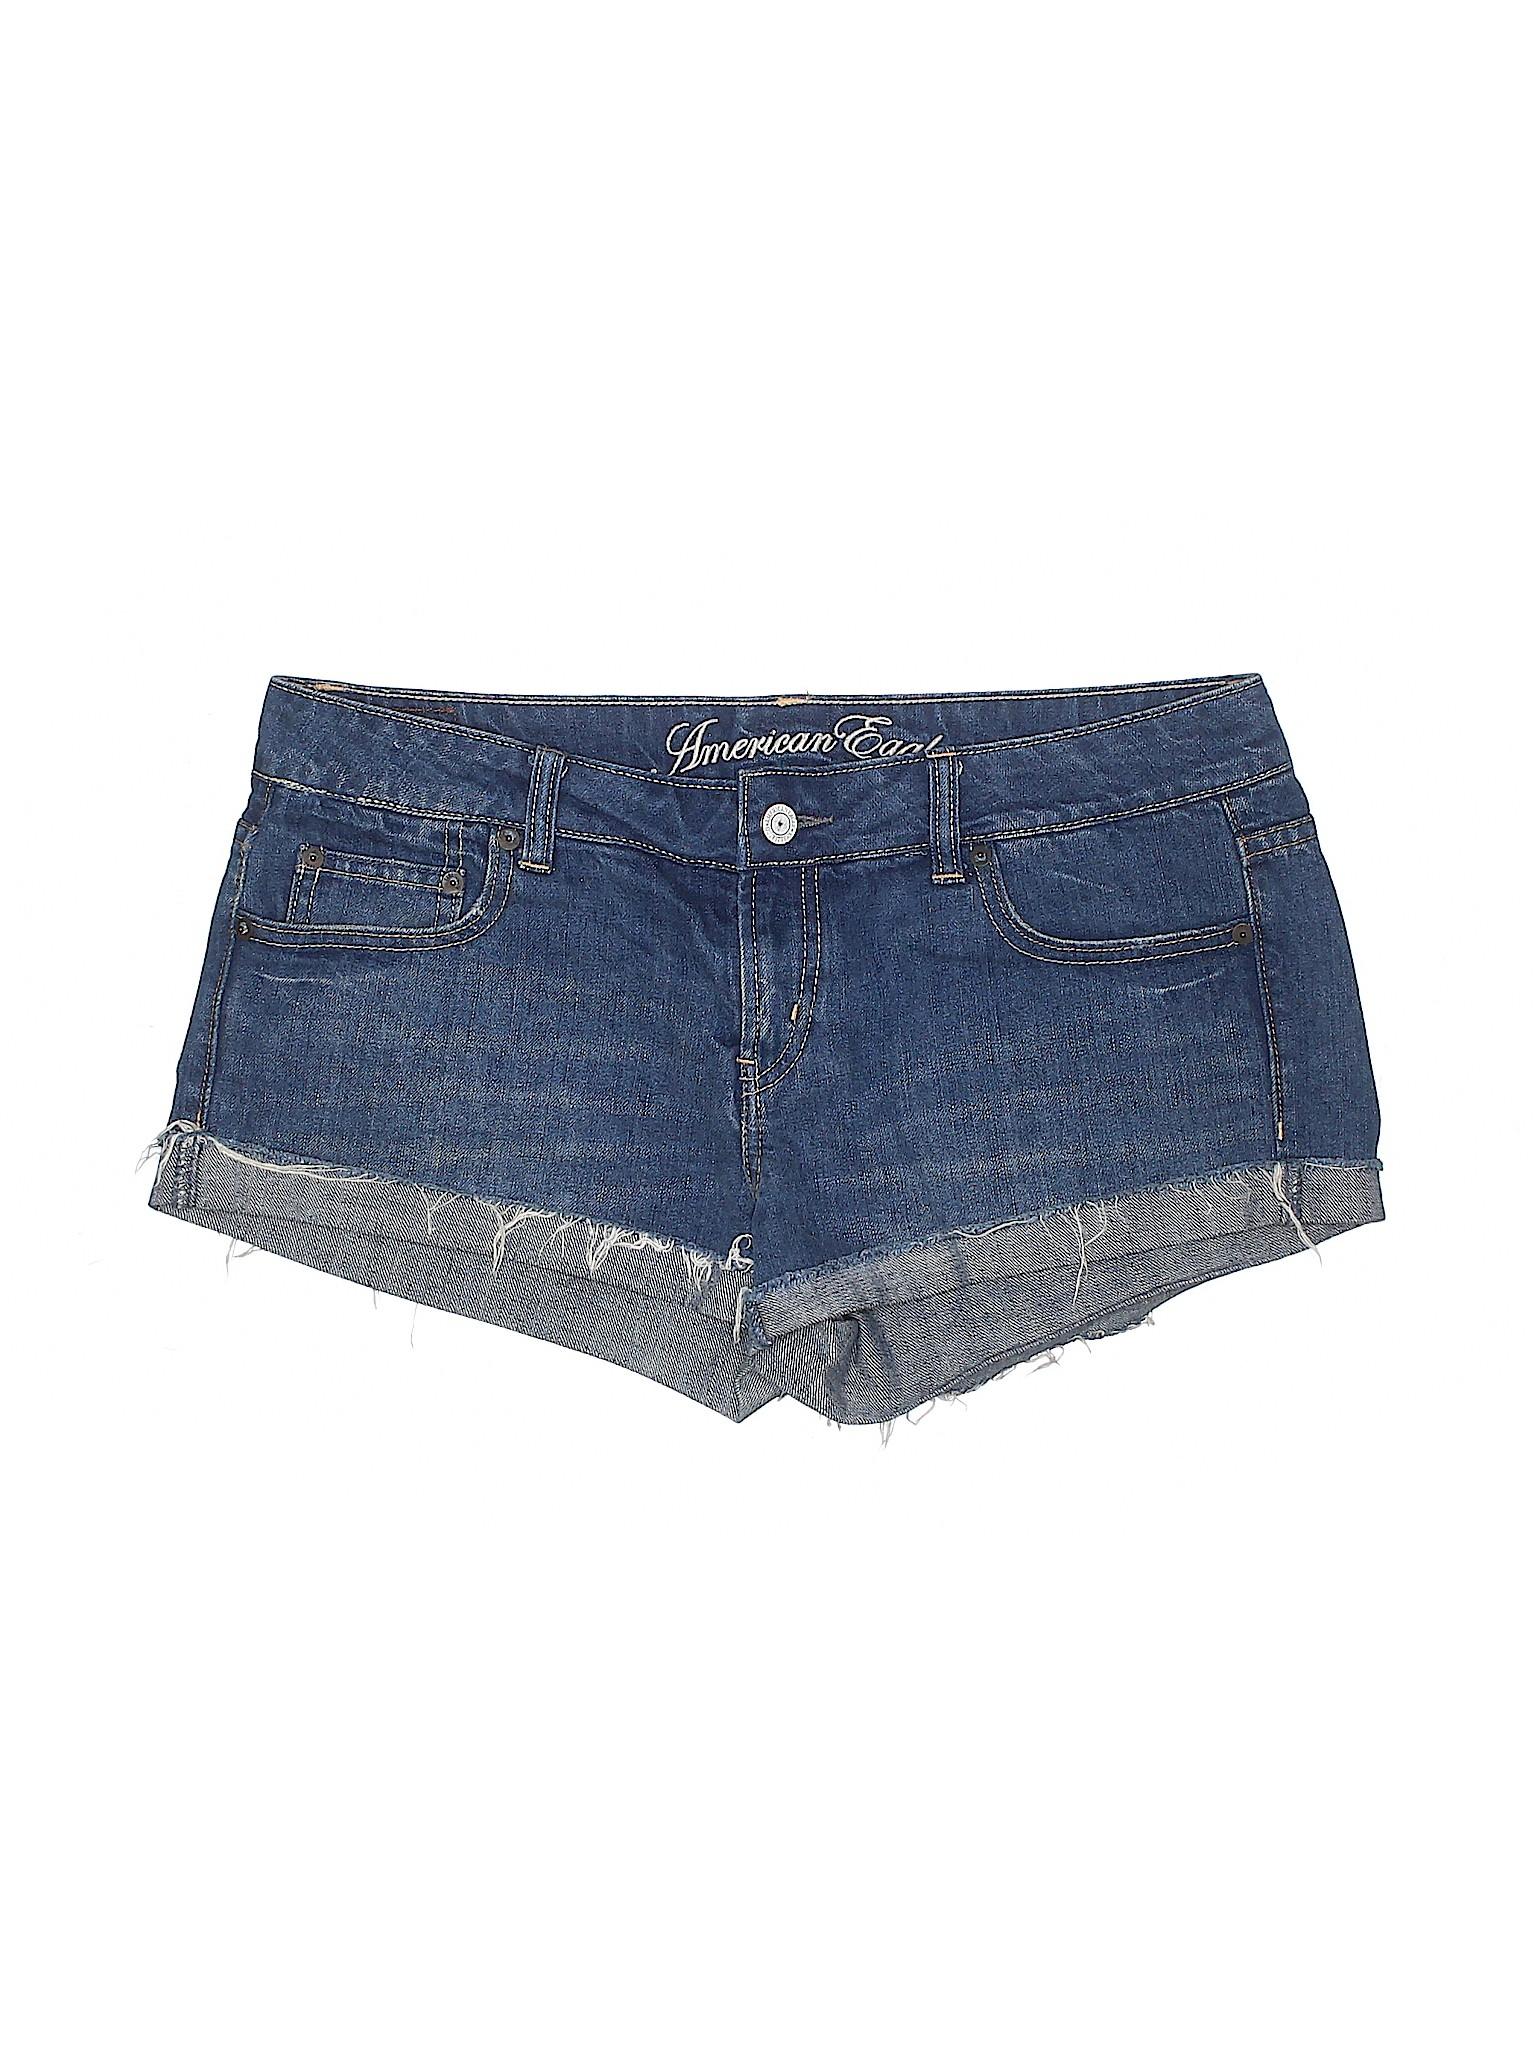 Denim Eagle Boutique American Shorts Outfitters tOqqTxz